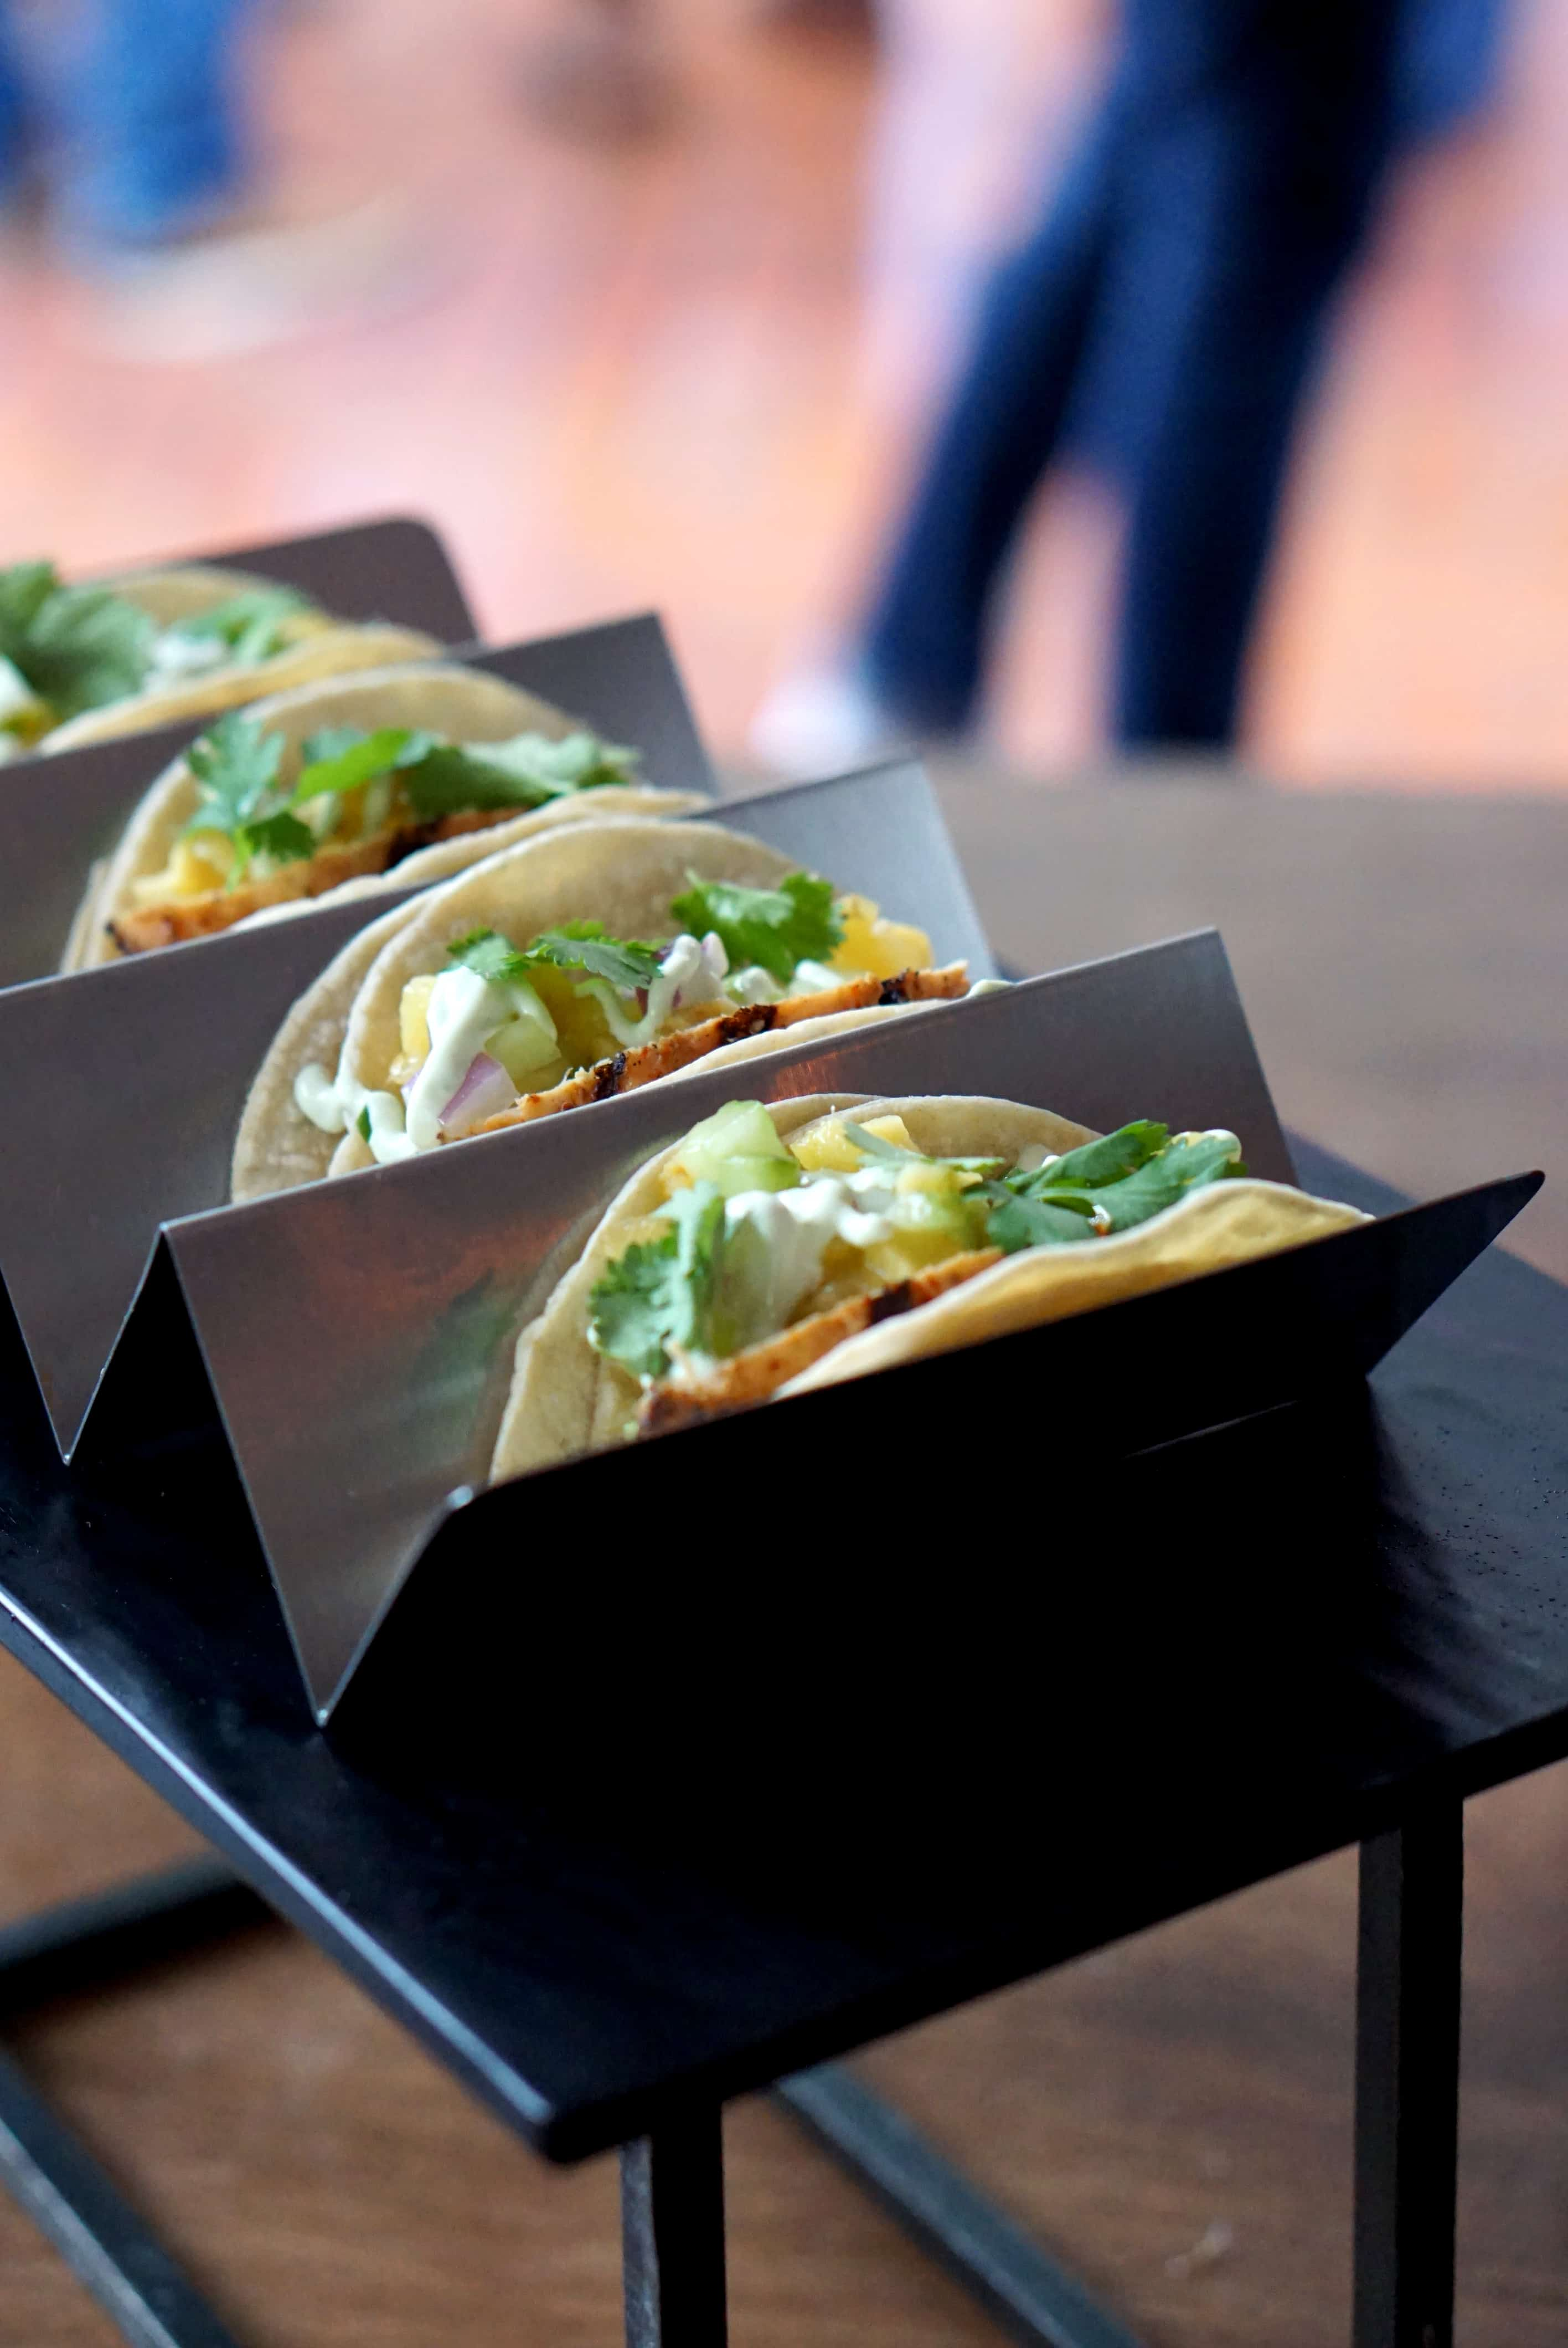 wolf-gourmet-blender-lenaskitchenblog_tacos5